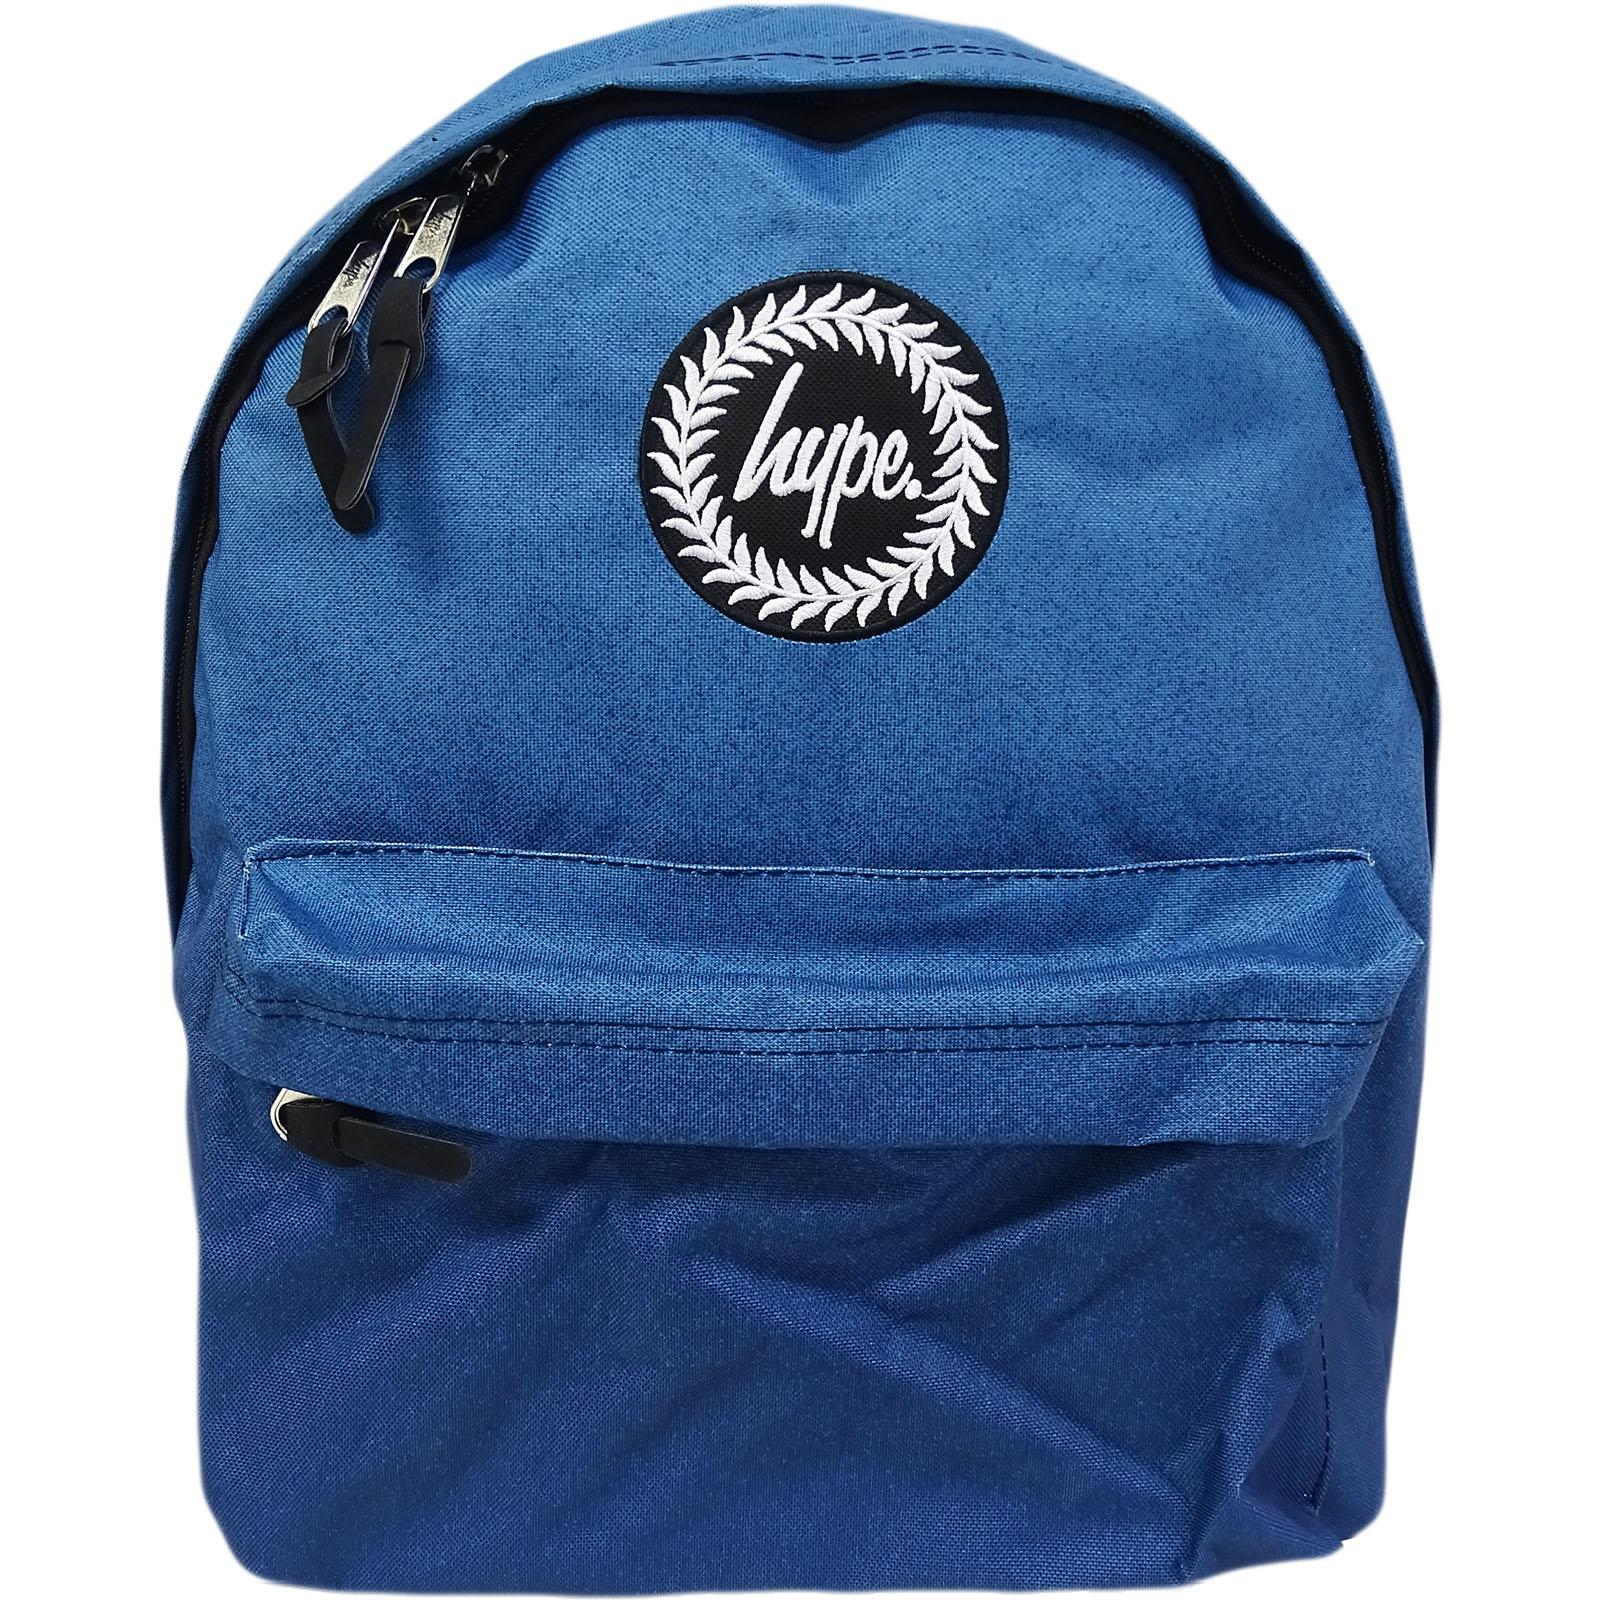 Unisexe-Hype-Sac-A-Dos-Ecole-Gym-SACS-pochettes-pencil-case miniature 113